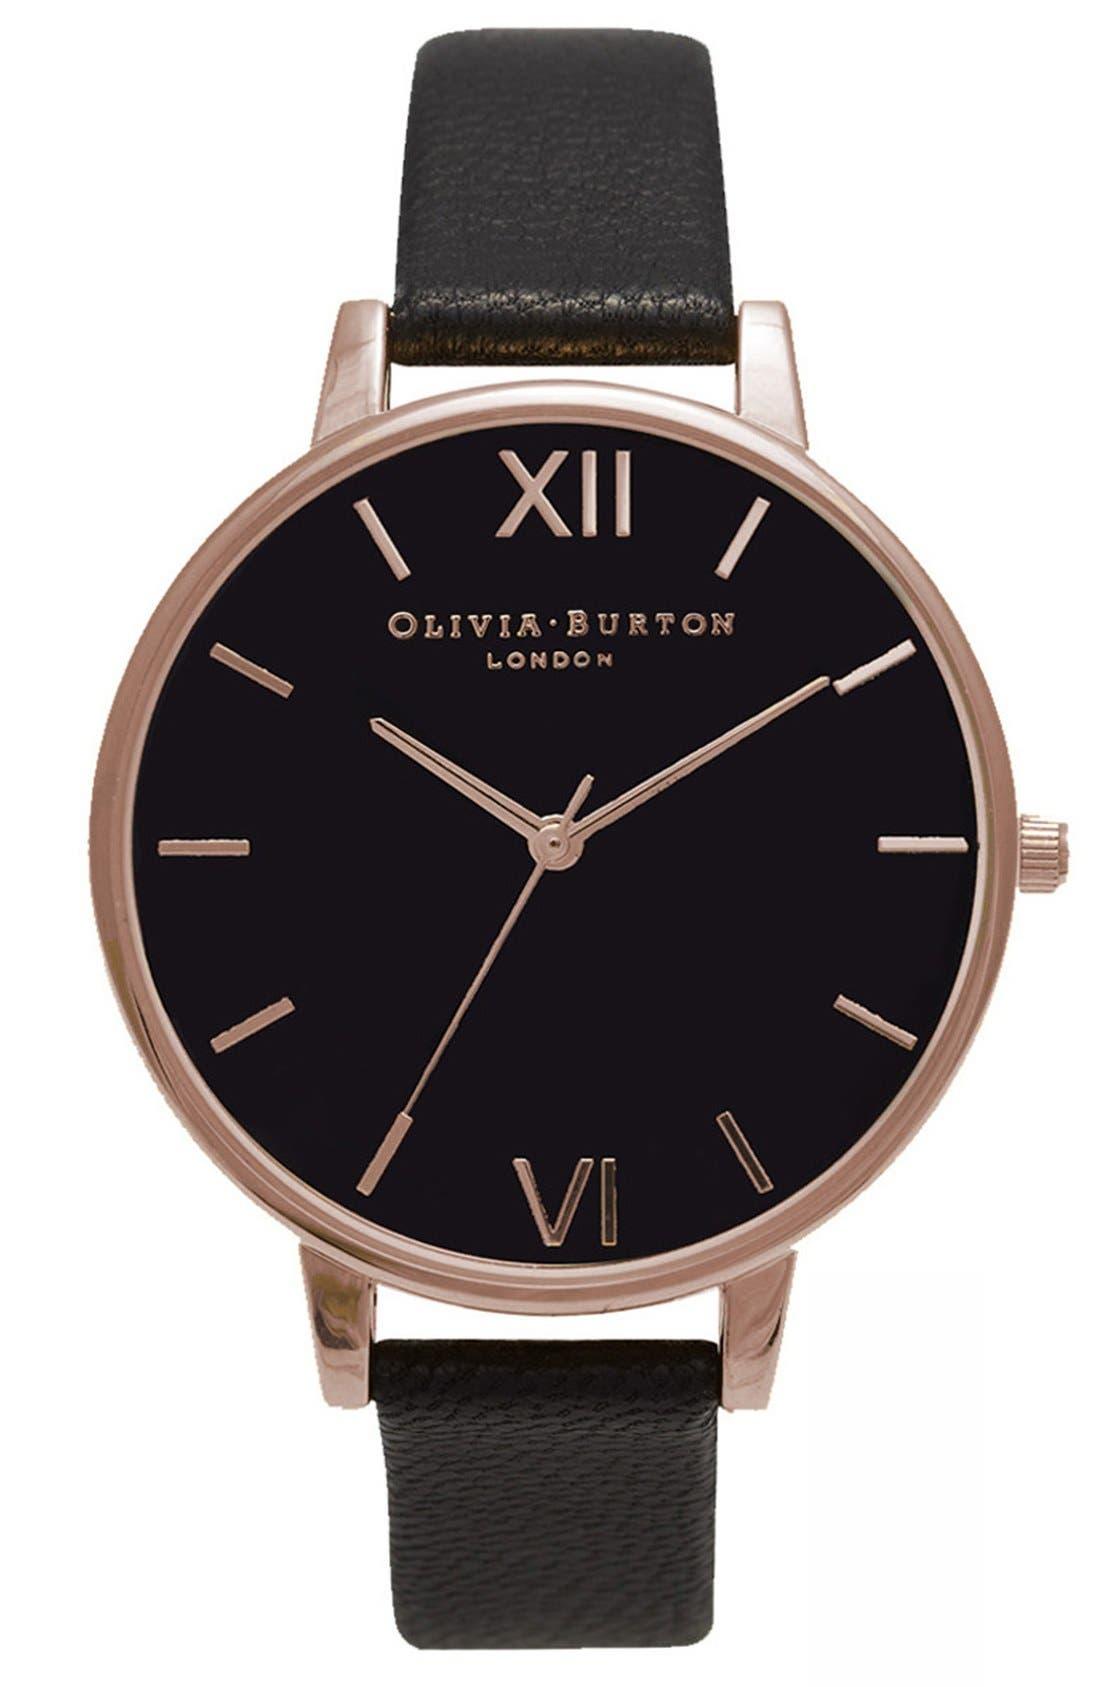 OLIVIA BURTON, Big Dial Leather Strap Watch, 38mm, Main thumbnail 1, color, BLACK/ BLACK/ ROSE GOLD